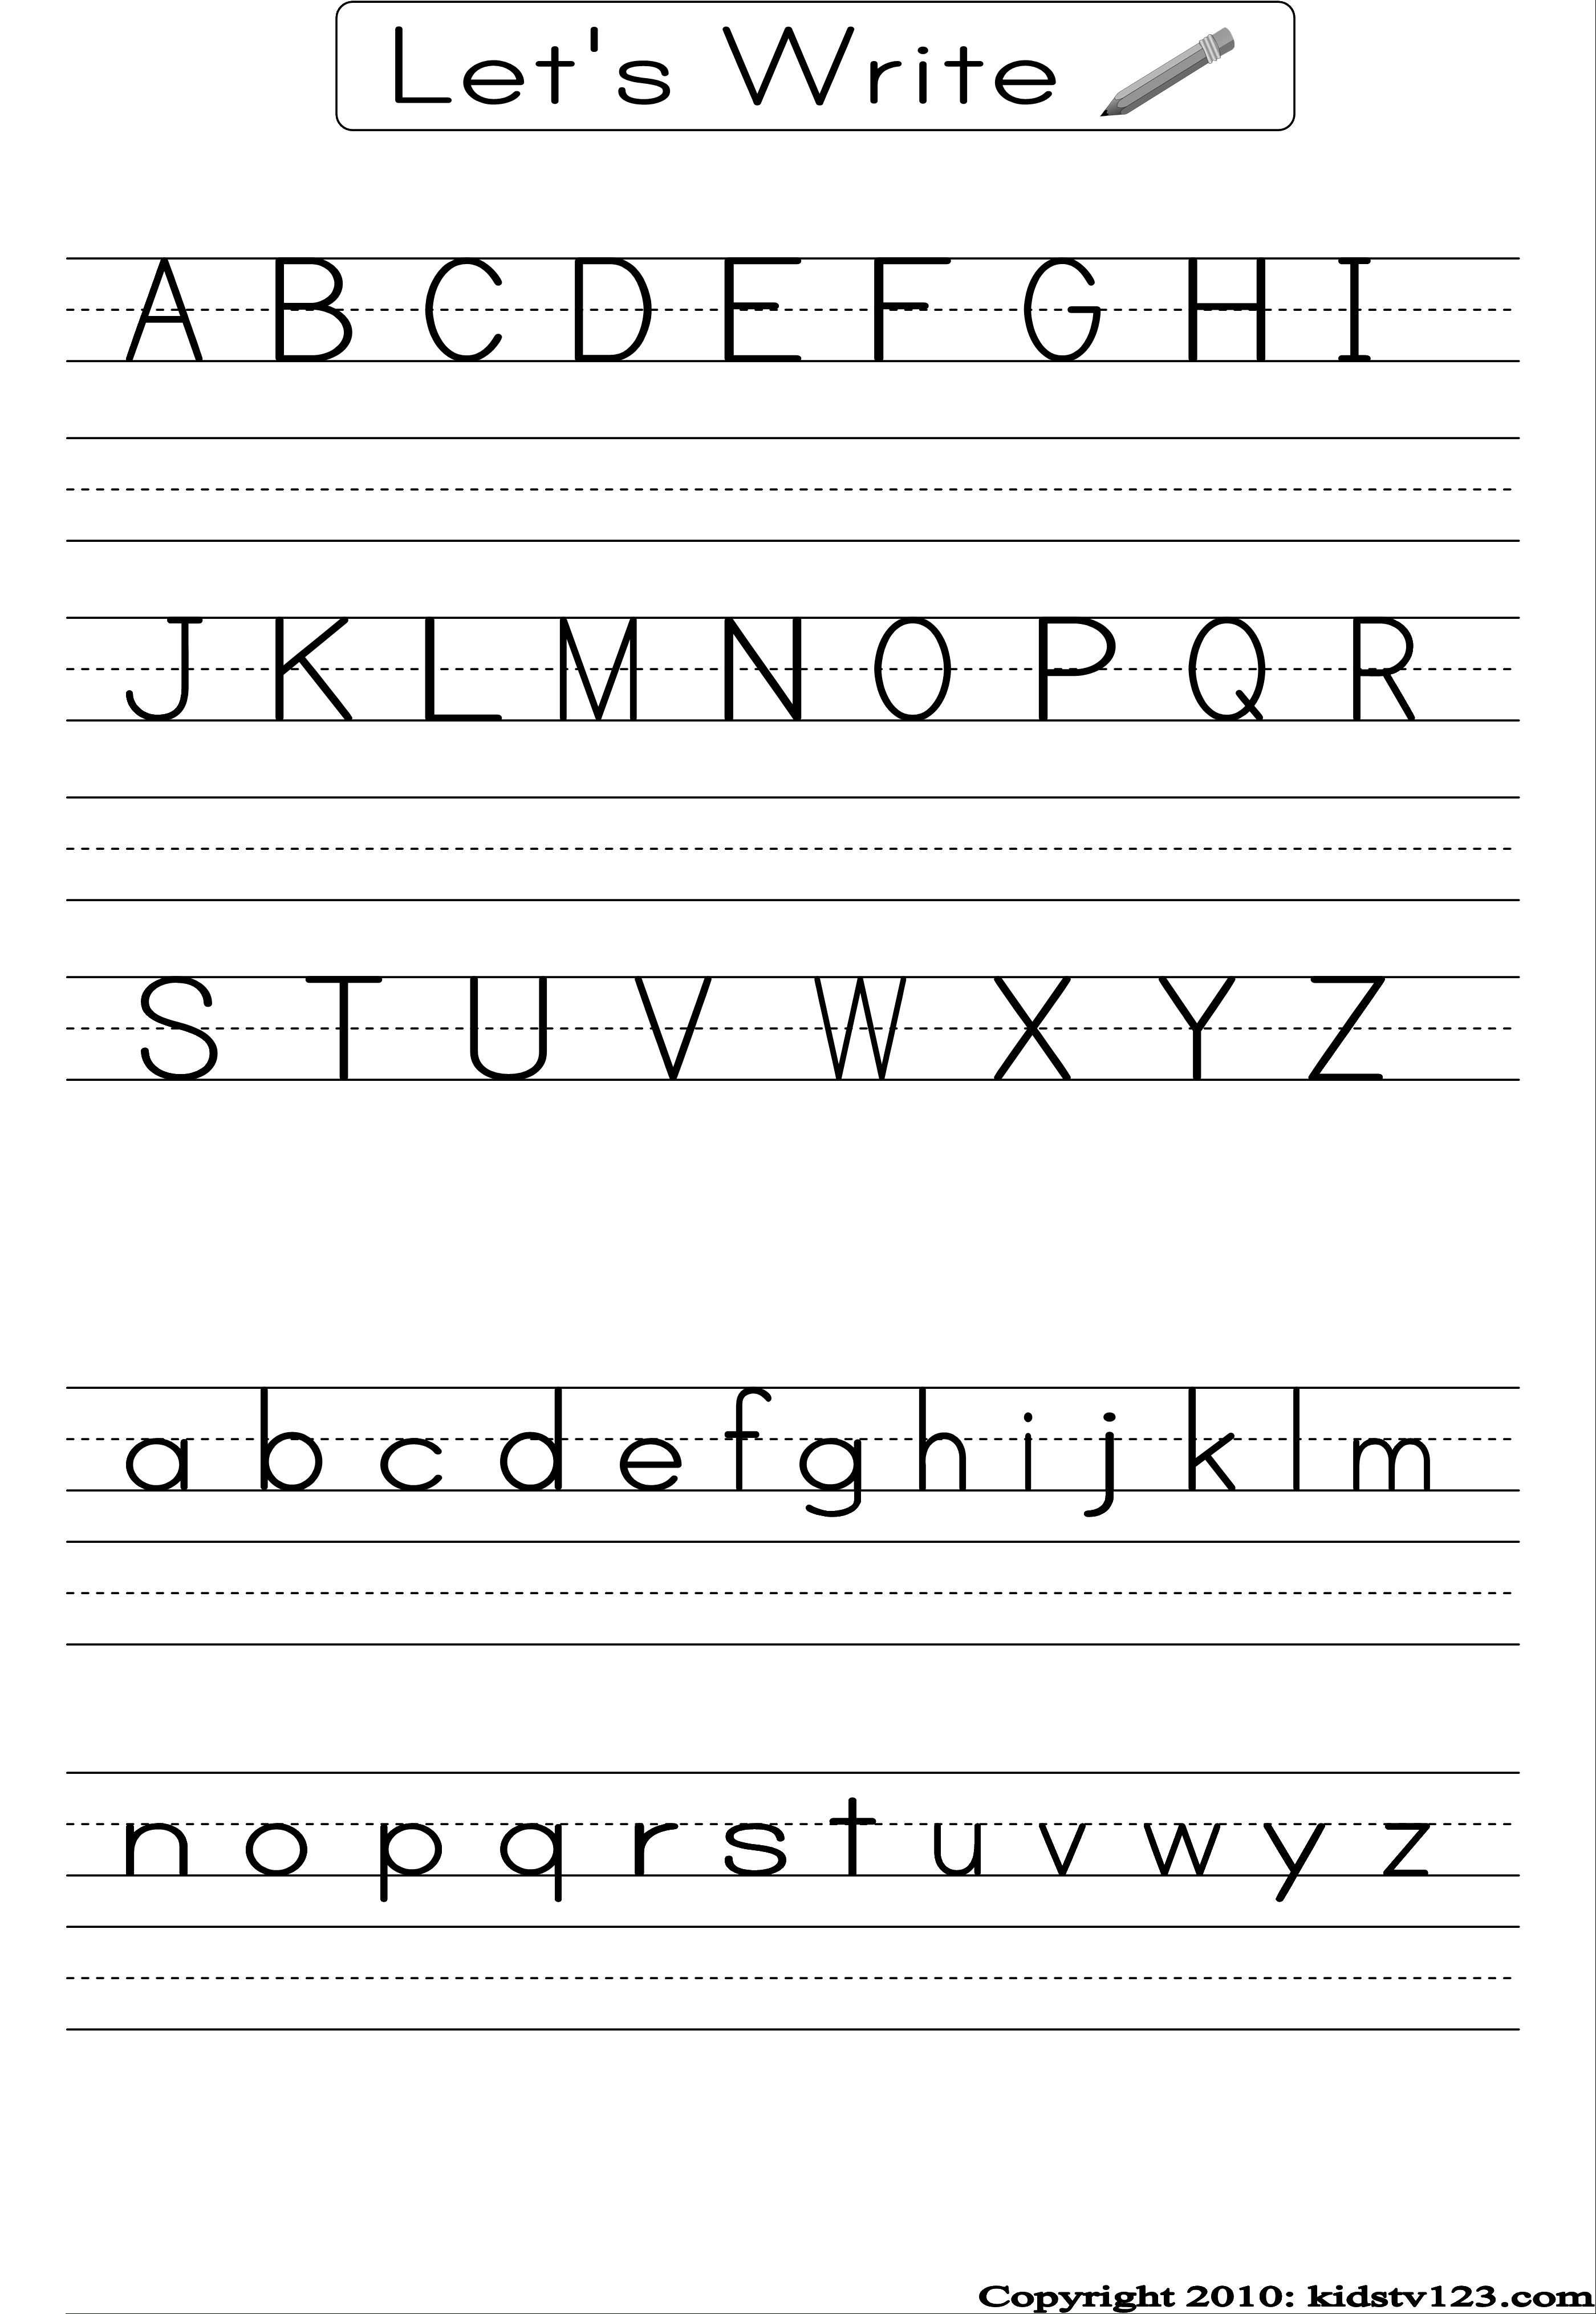 Free Printable Alphabet Worksheets, Preschool Writing And Pattern - Free Printable Alphabet Worksheets For Kindergarten